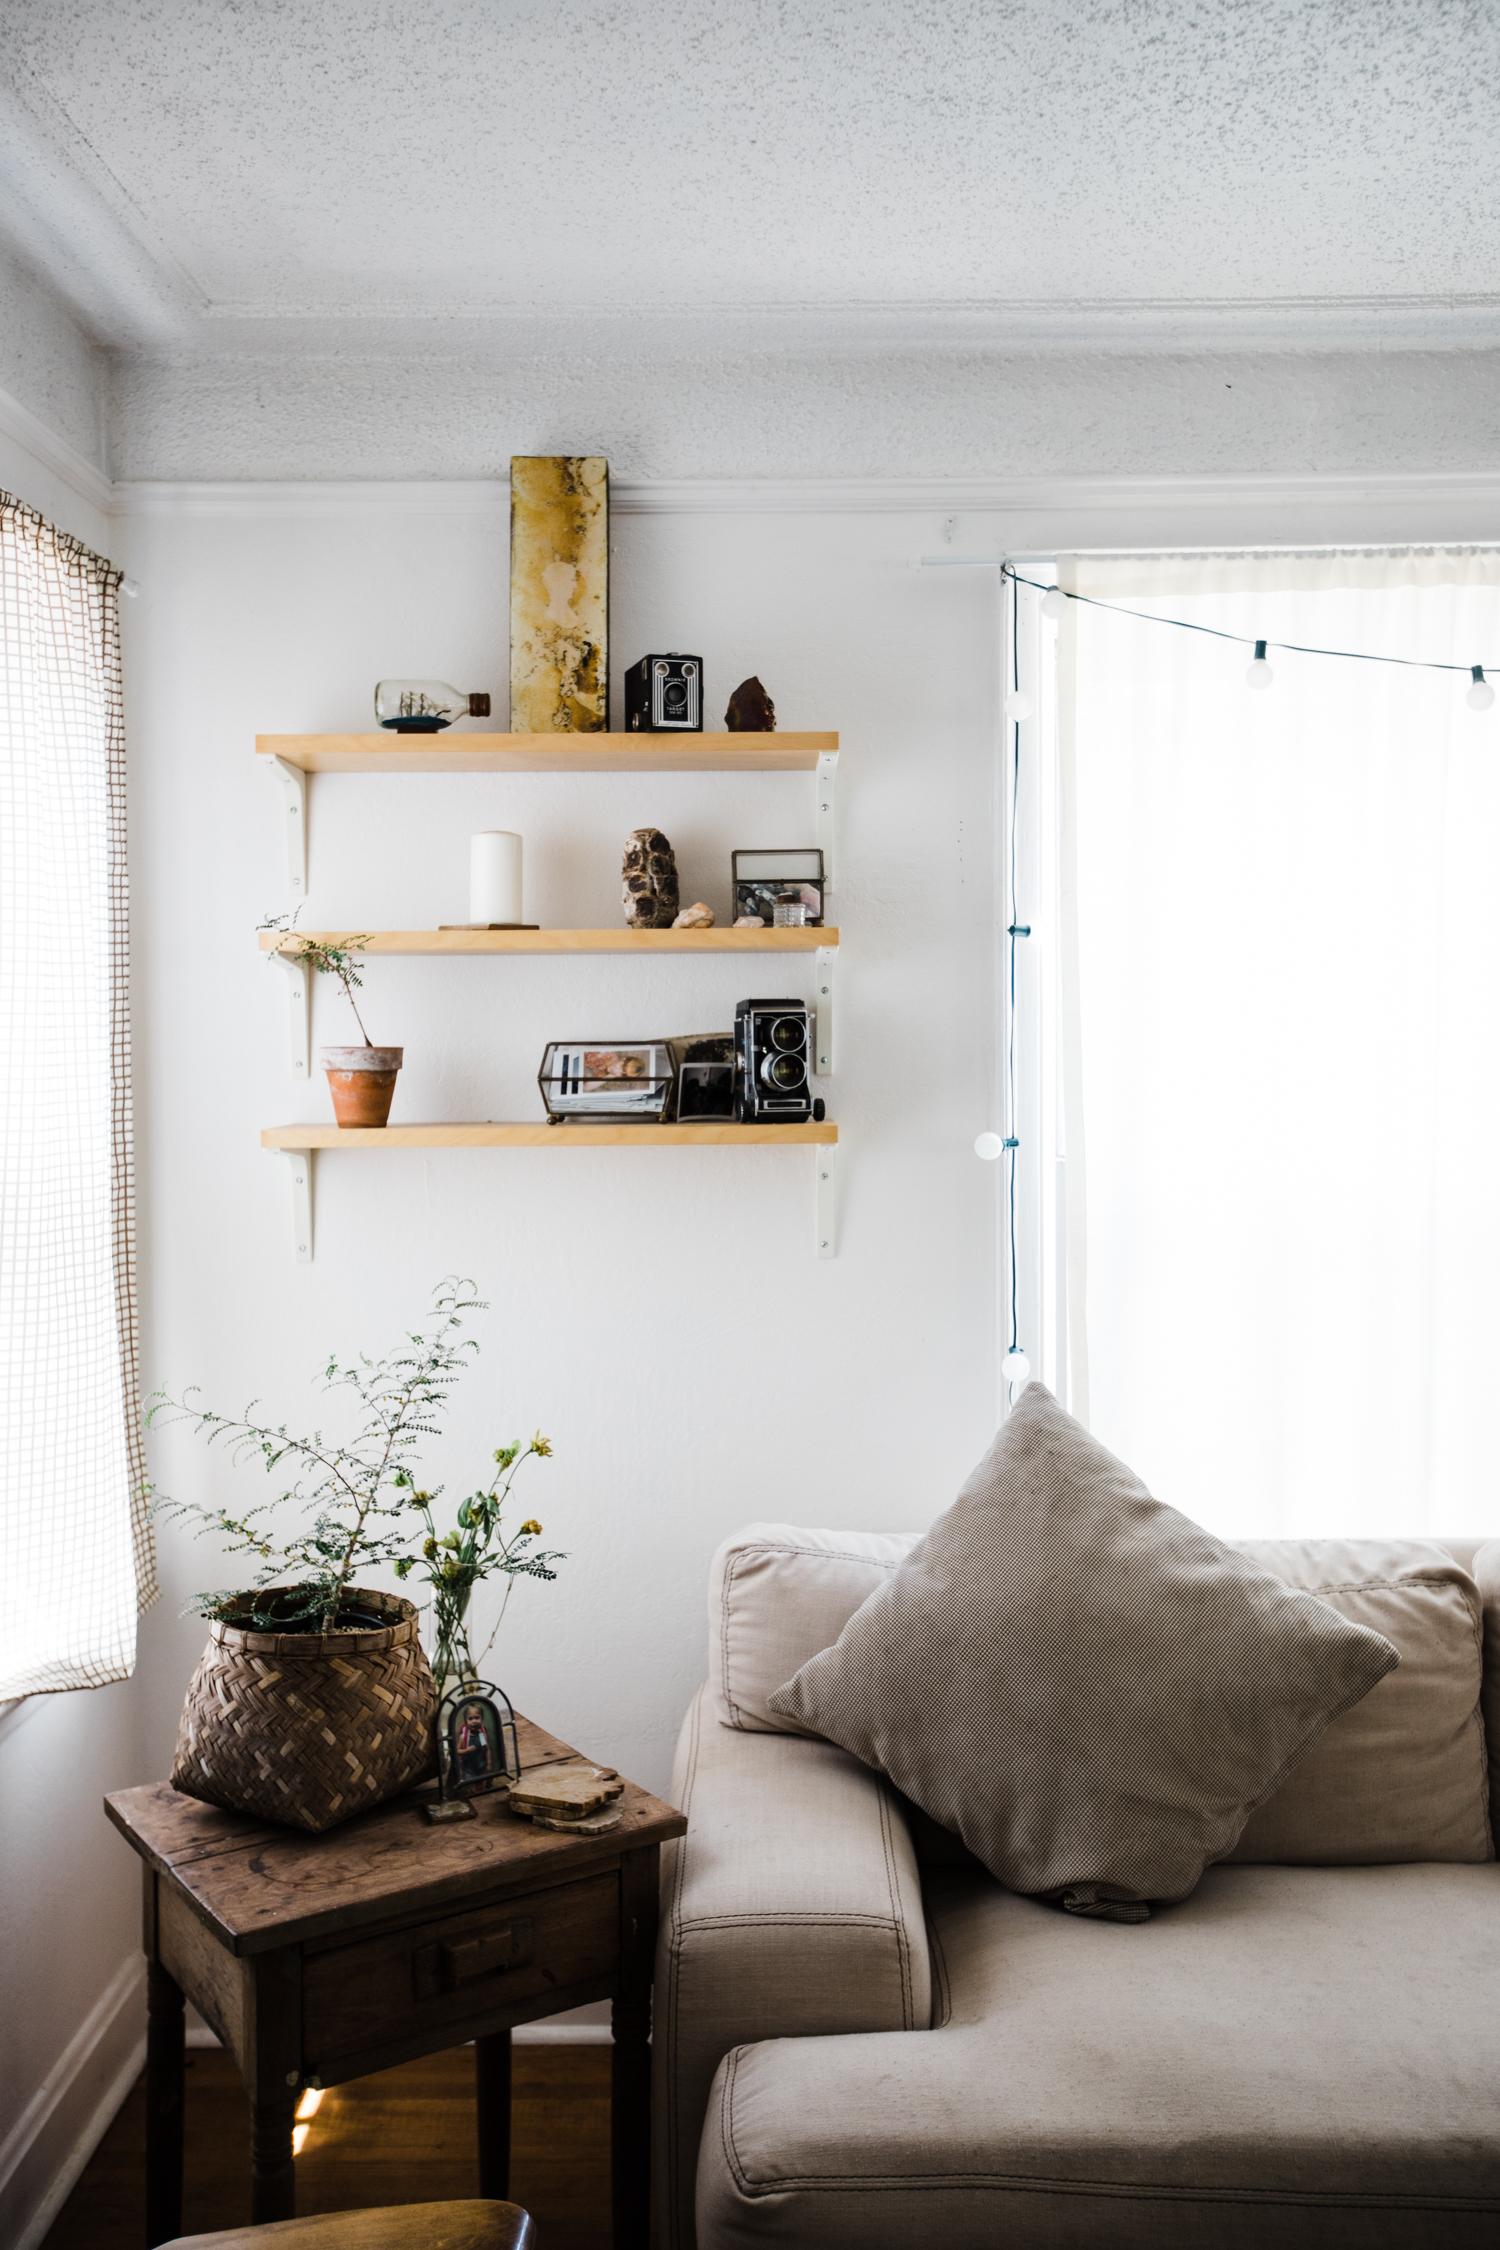 fowler-home-vintage-minimal-WEB-18.jpg